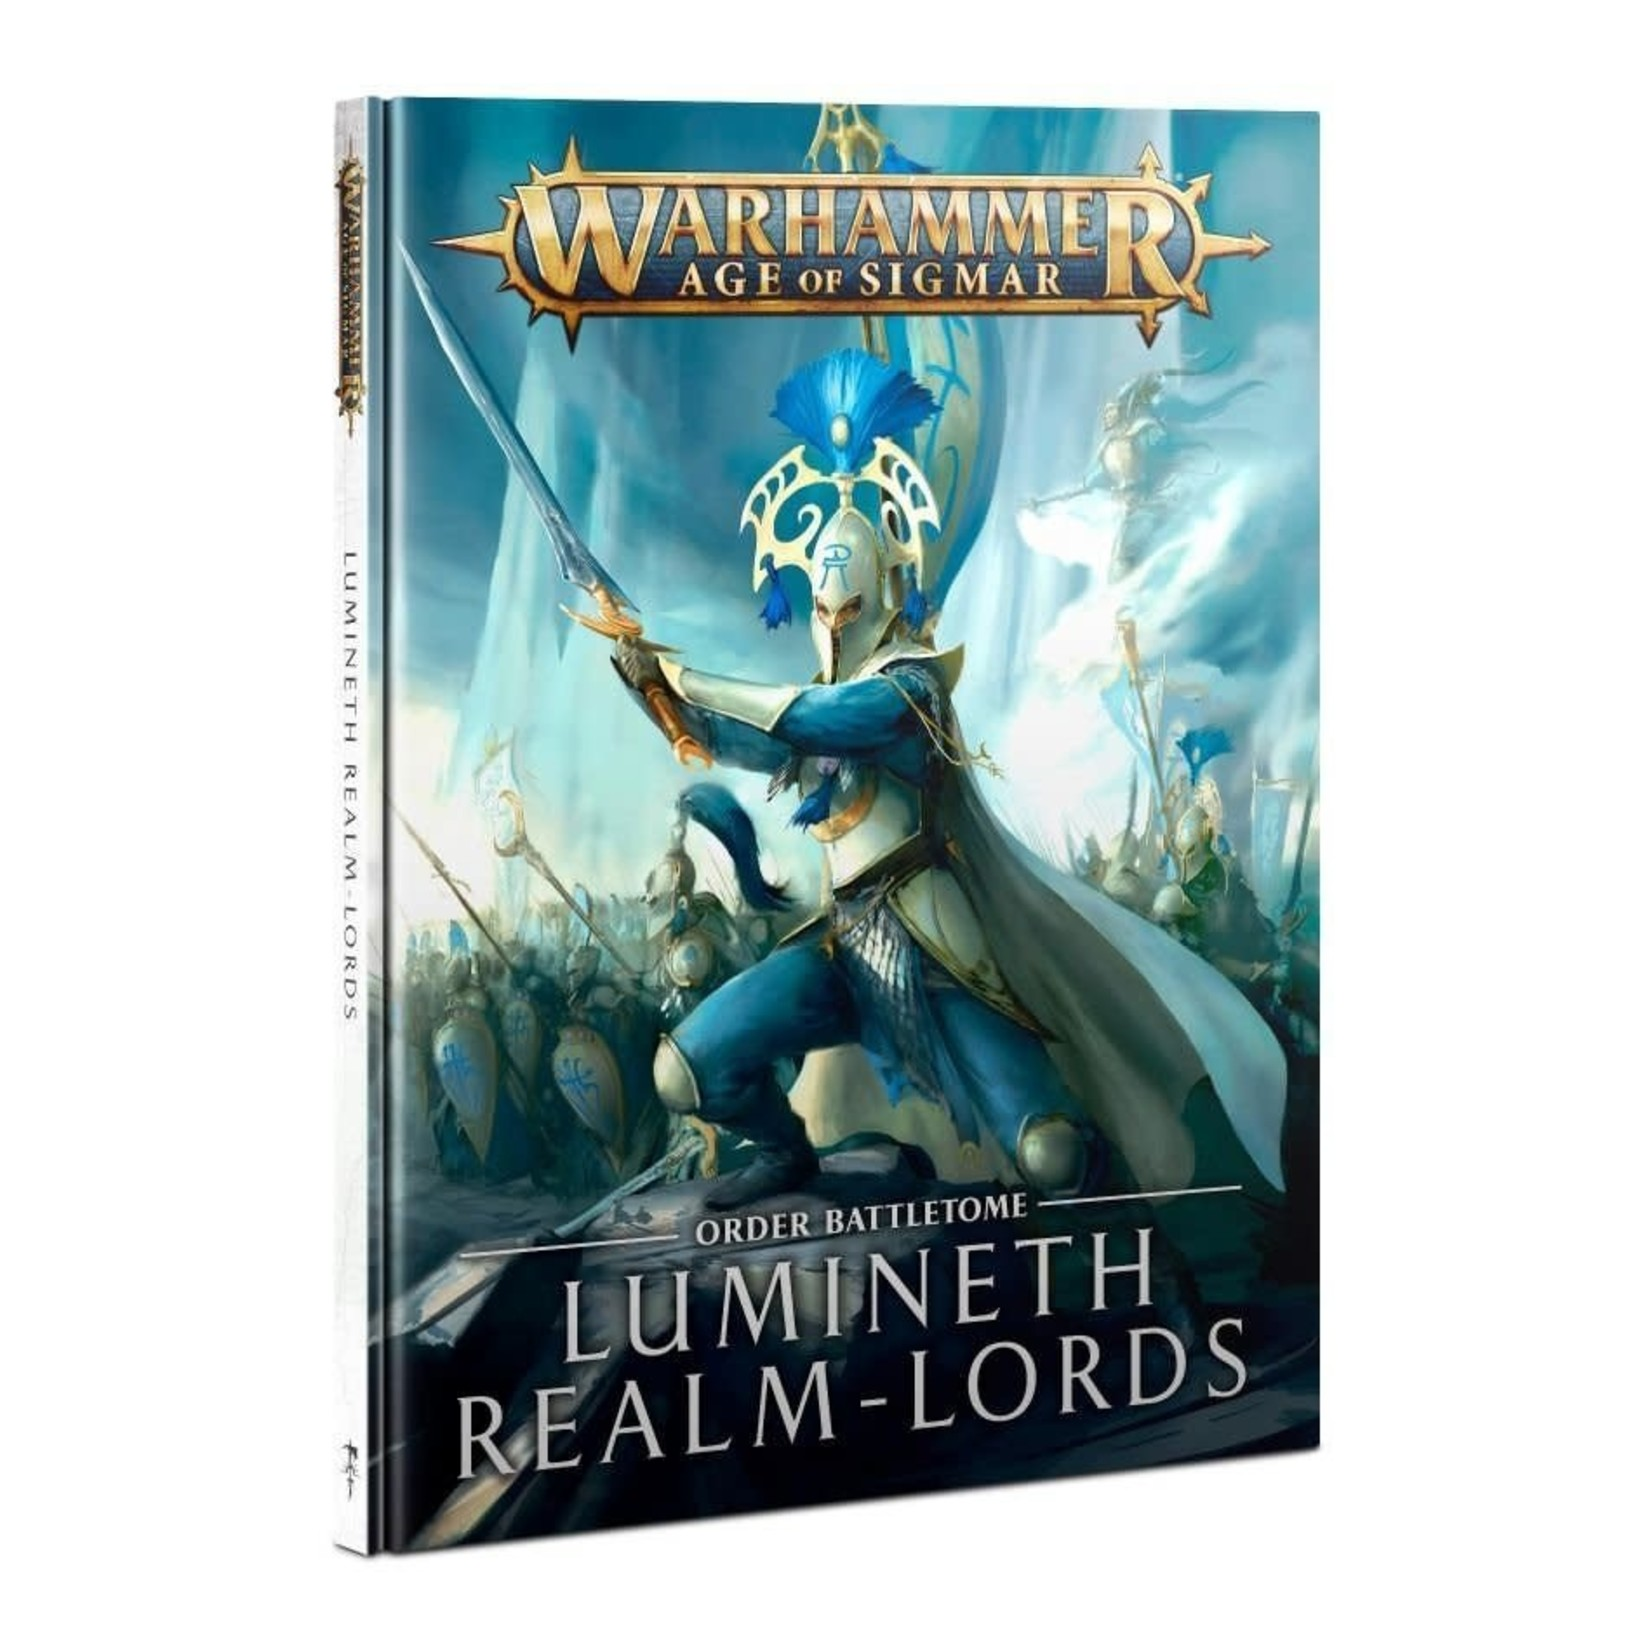 Games Workshop Warhammer Age of Sigmar: Battletome - Lumineth Realm-Lords (new 2021)